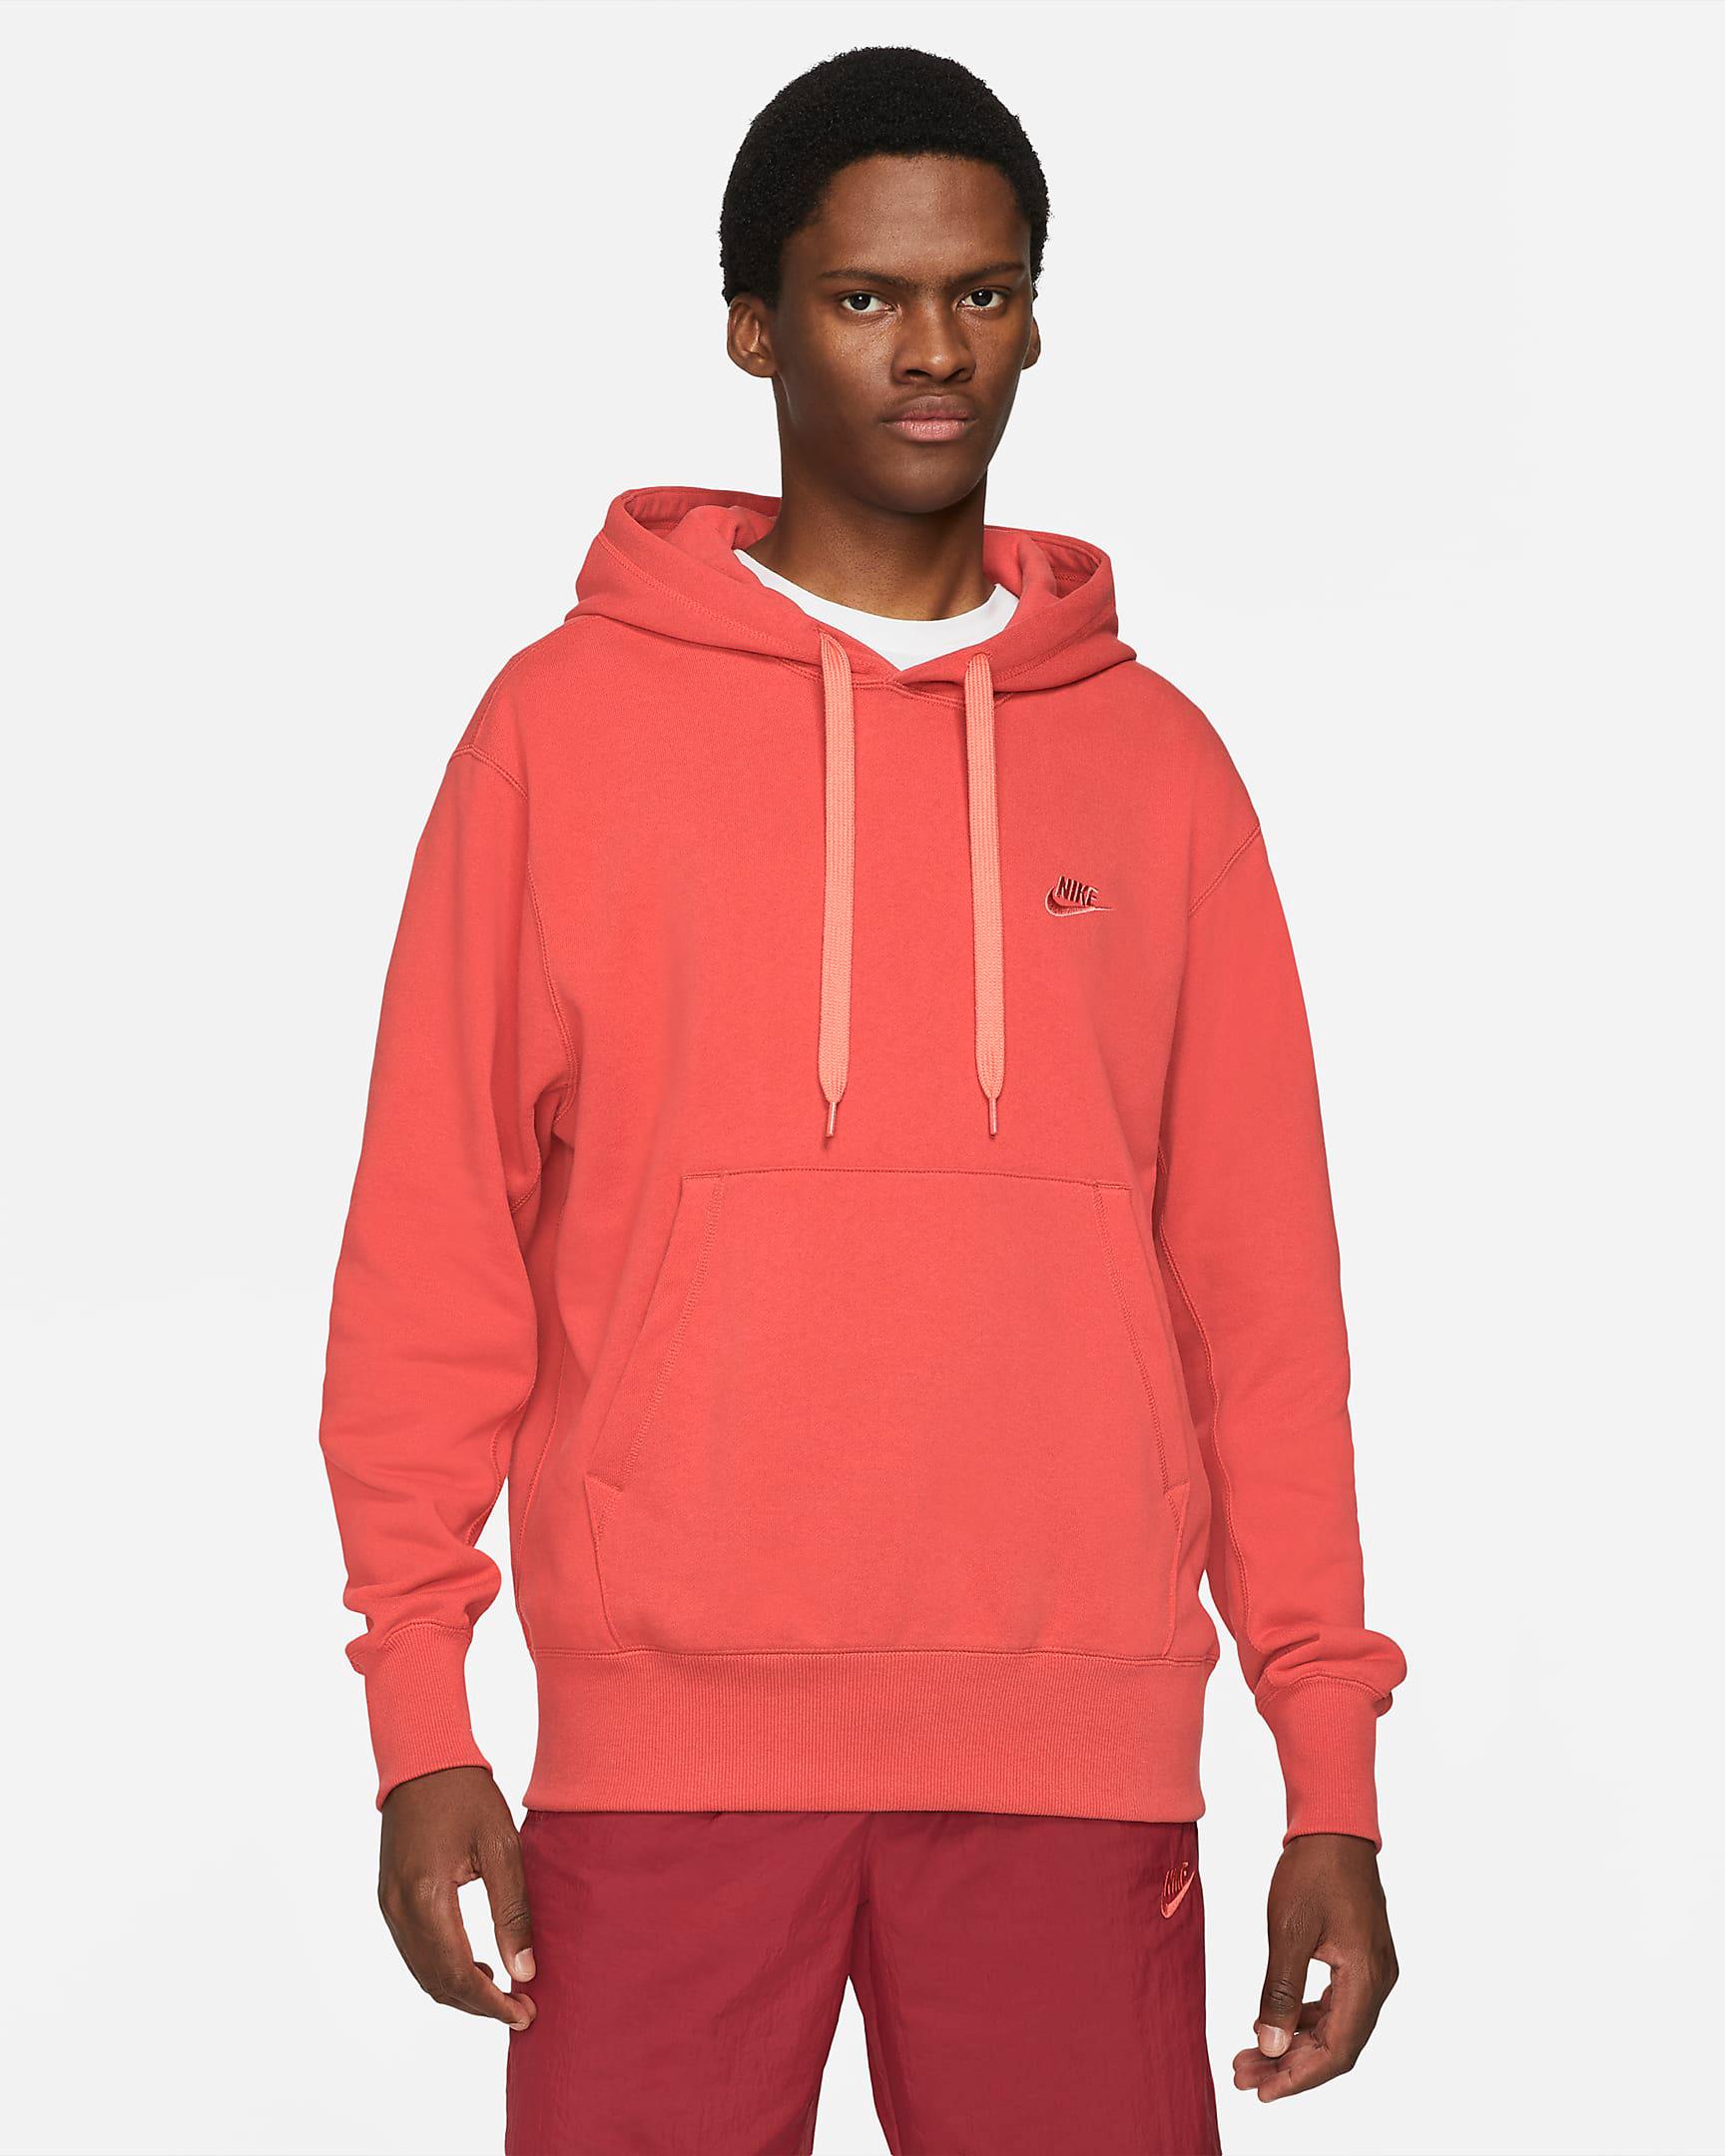 nike-lobster-classic-pullover-hoodie